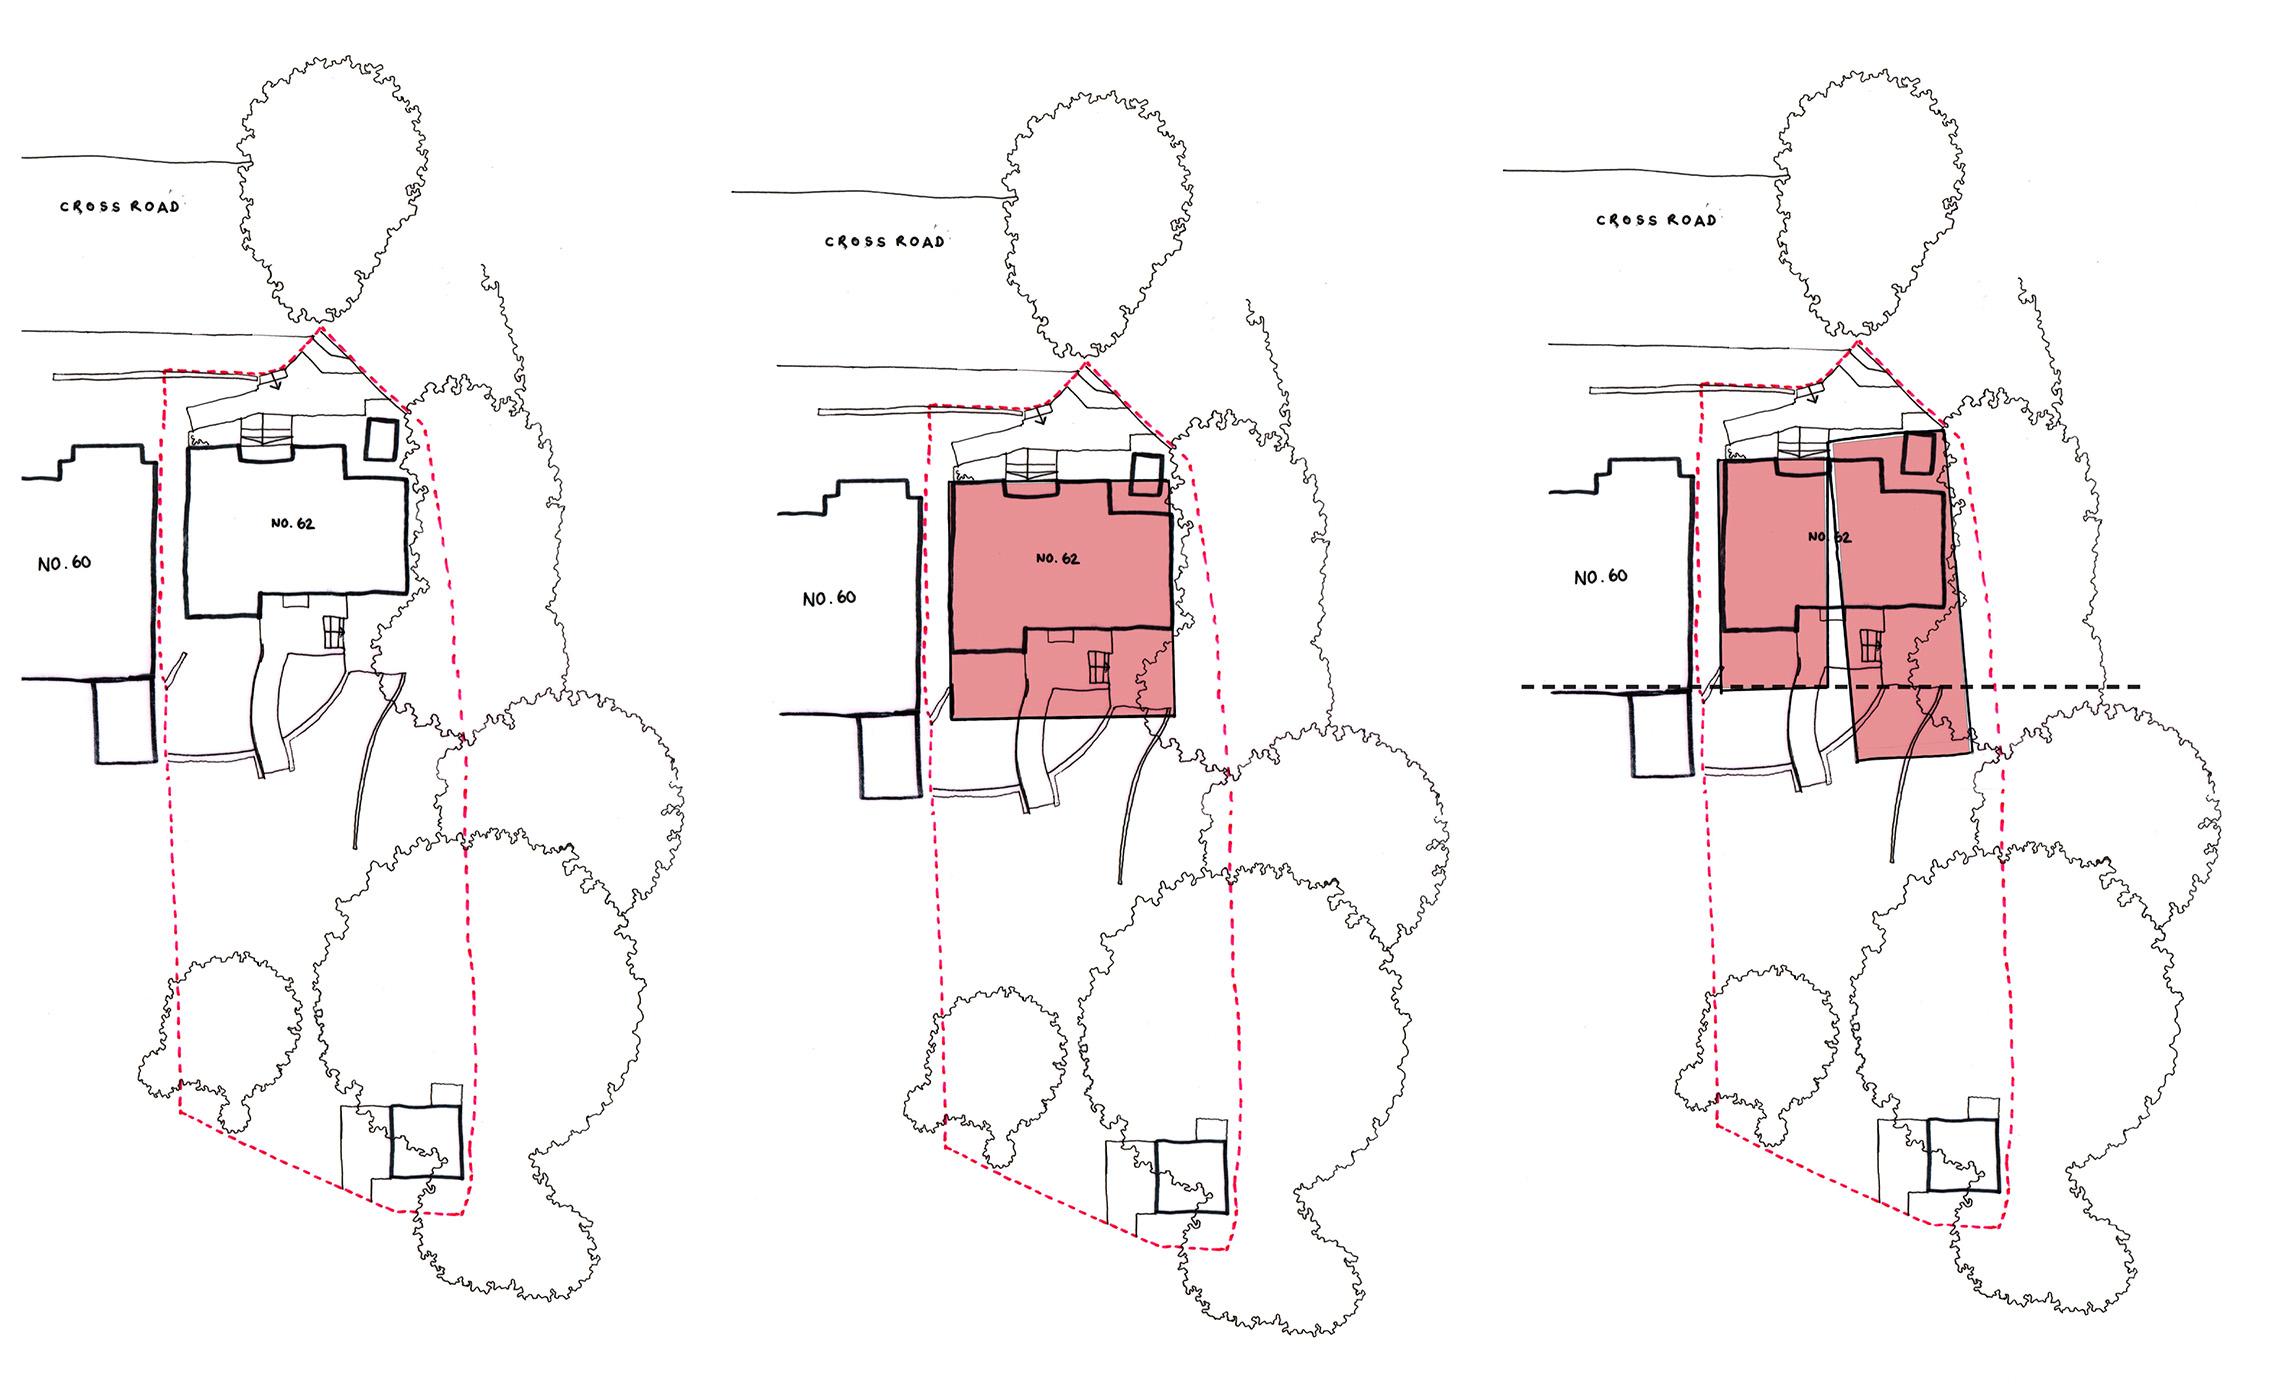 left: existing dwelling - footprint                           middle: square footprint                               right: split volume footprint